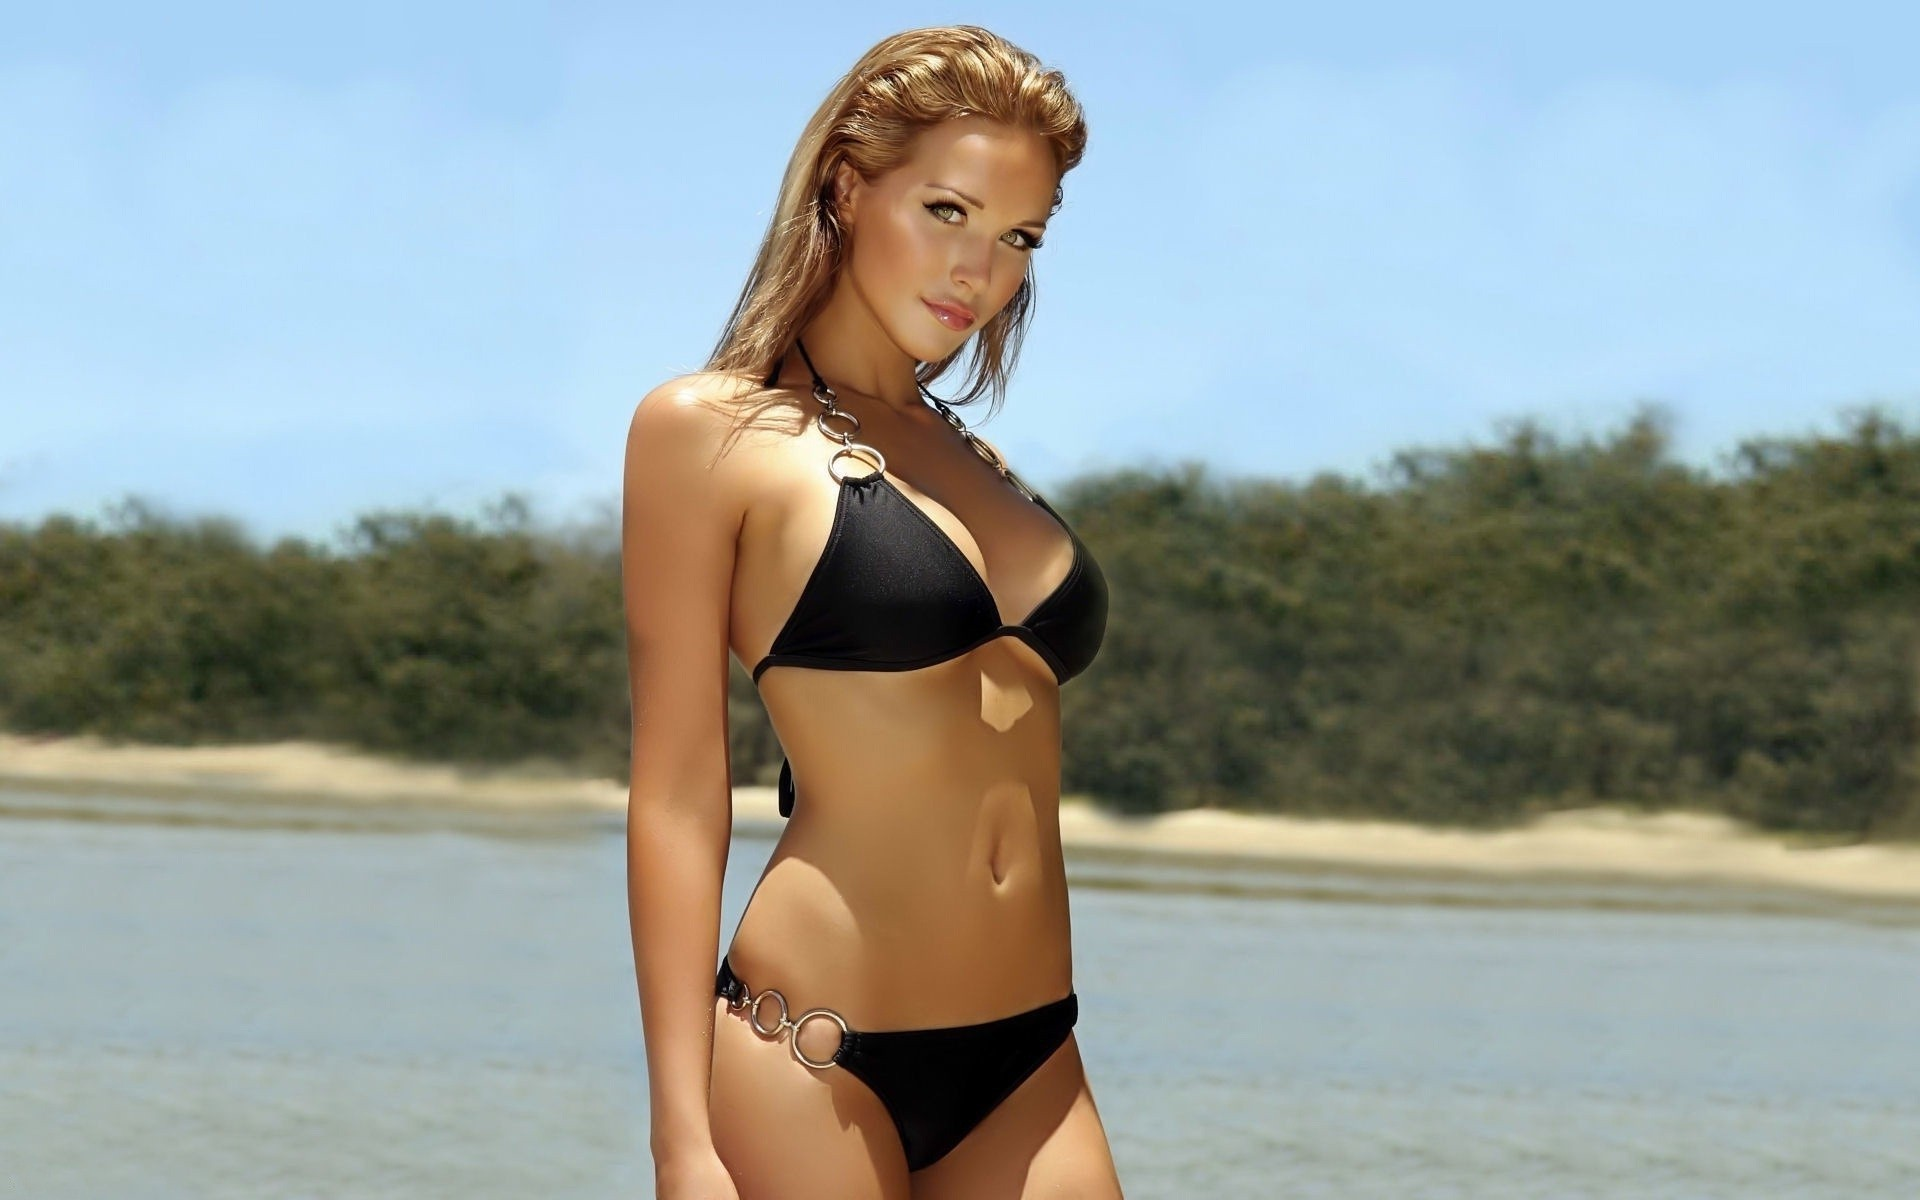 Chubby nude bikini mature ladies